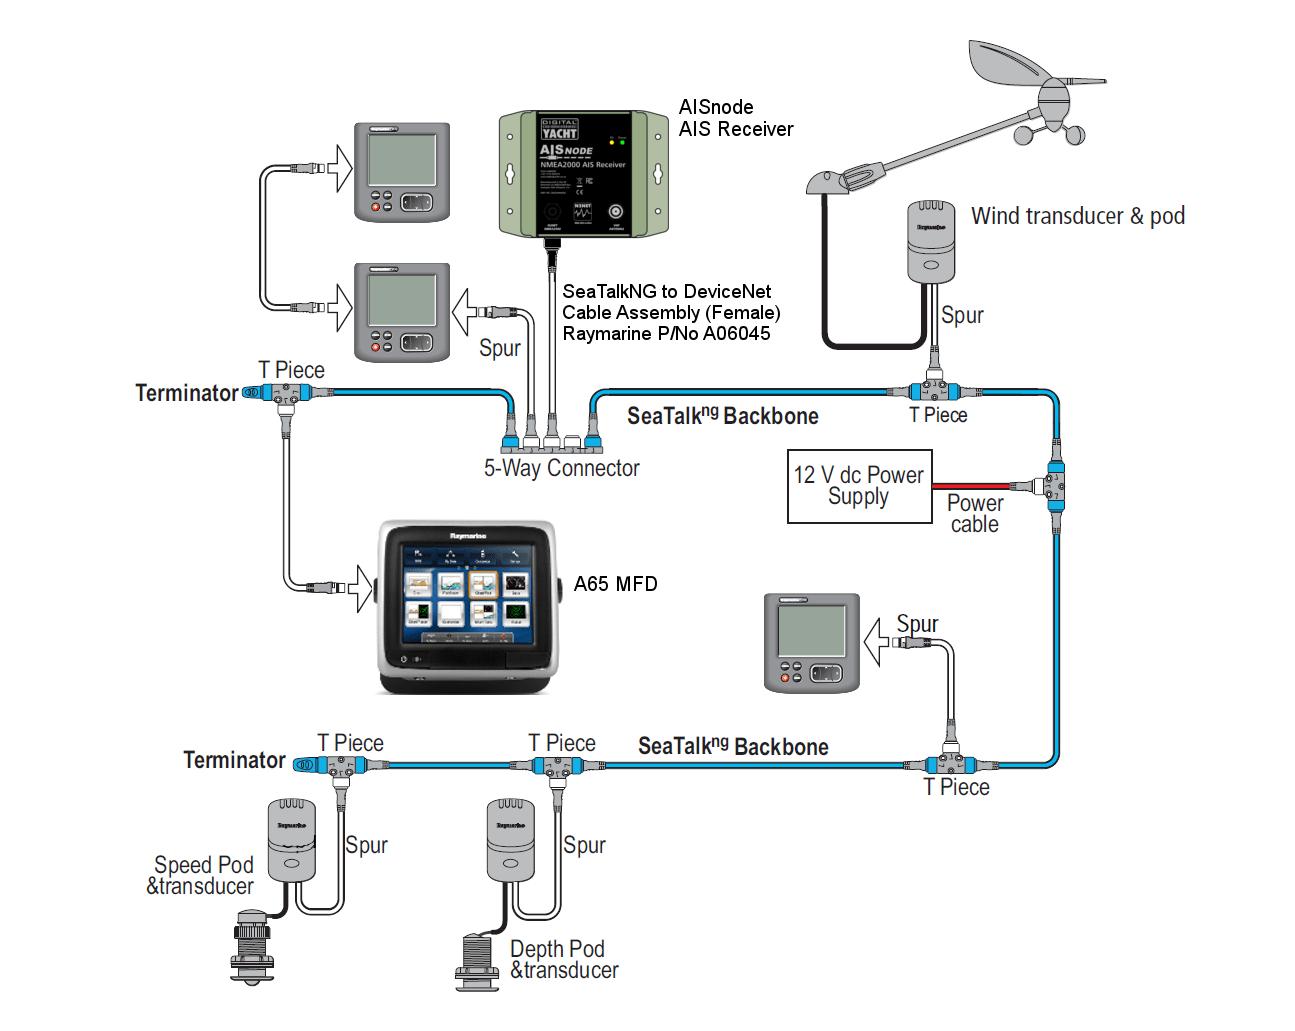 Garmin G5 Wiring Diagram